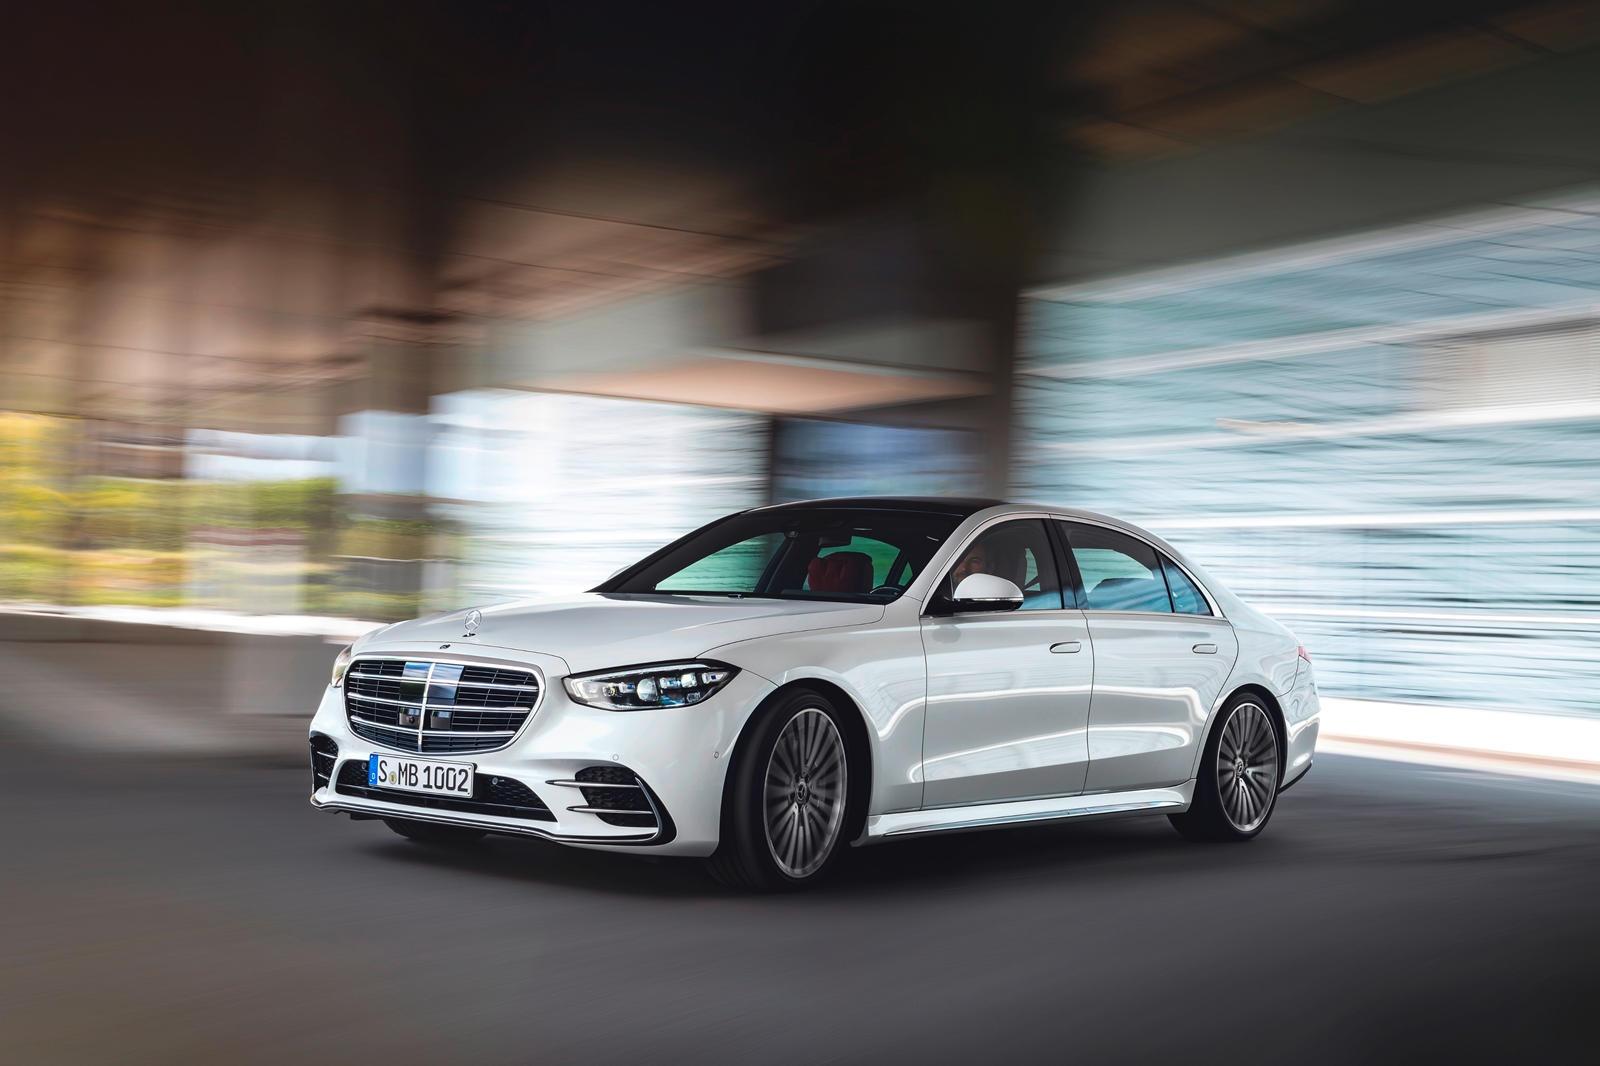 danh gia Mercedes-Benz S-Class 2021 anh 1